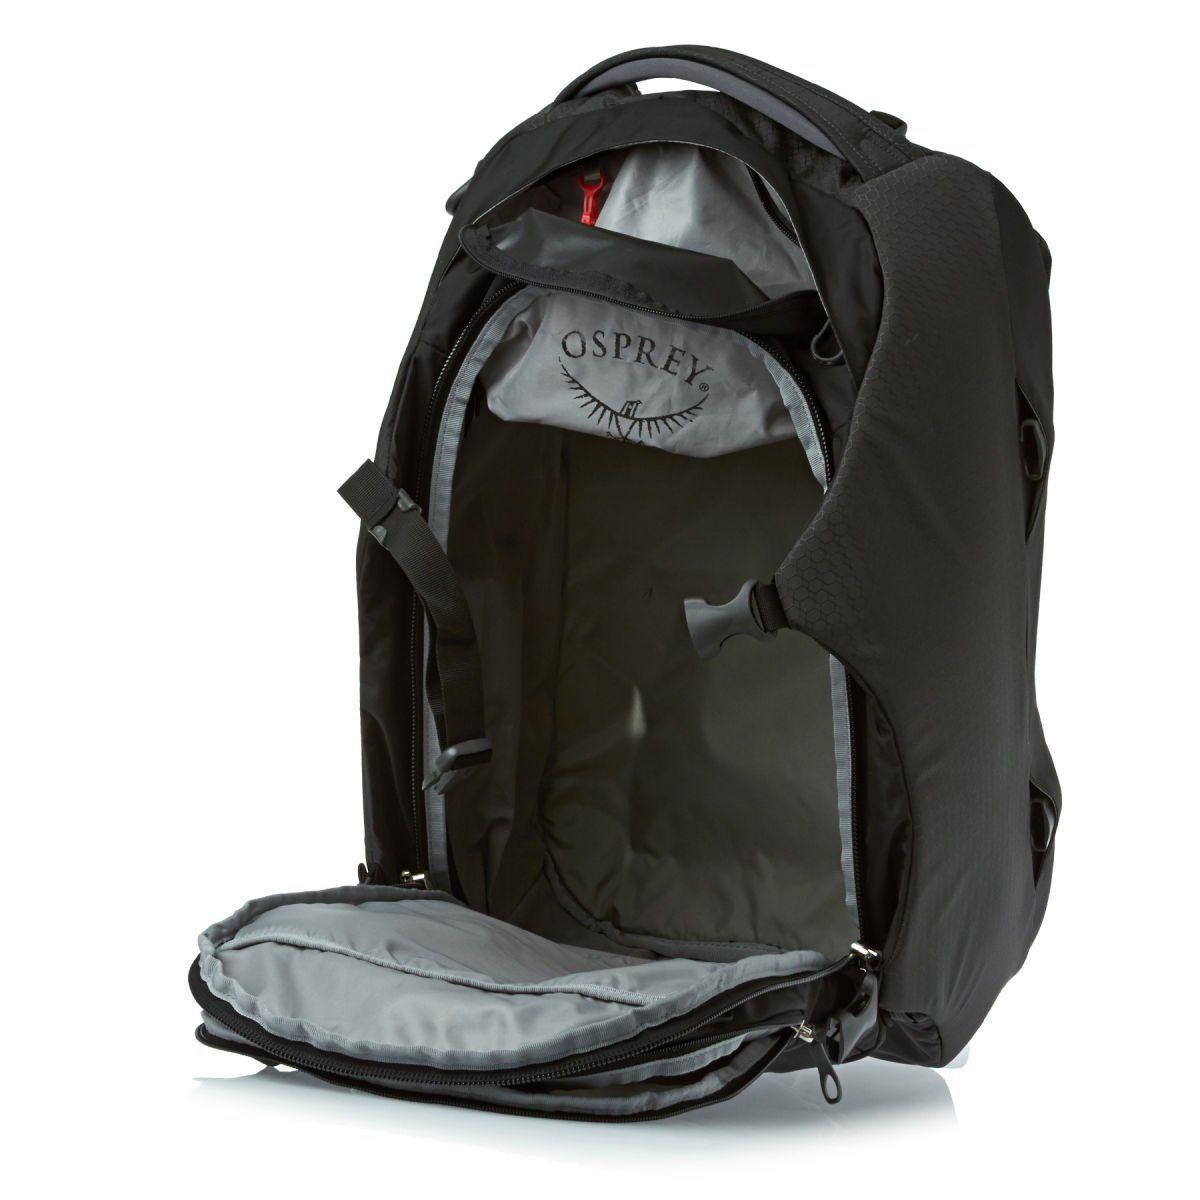 Amazon.com : Osprey Porter Travel Duffel Bag, Black, 46-Liter : Clothing